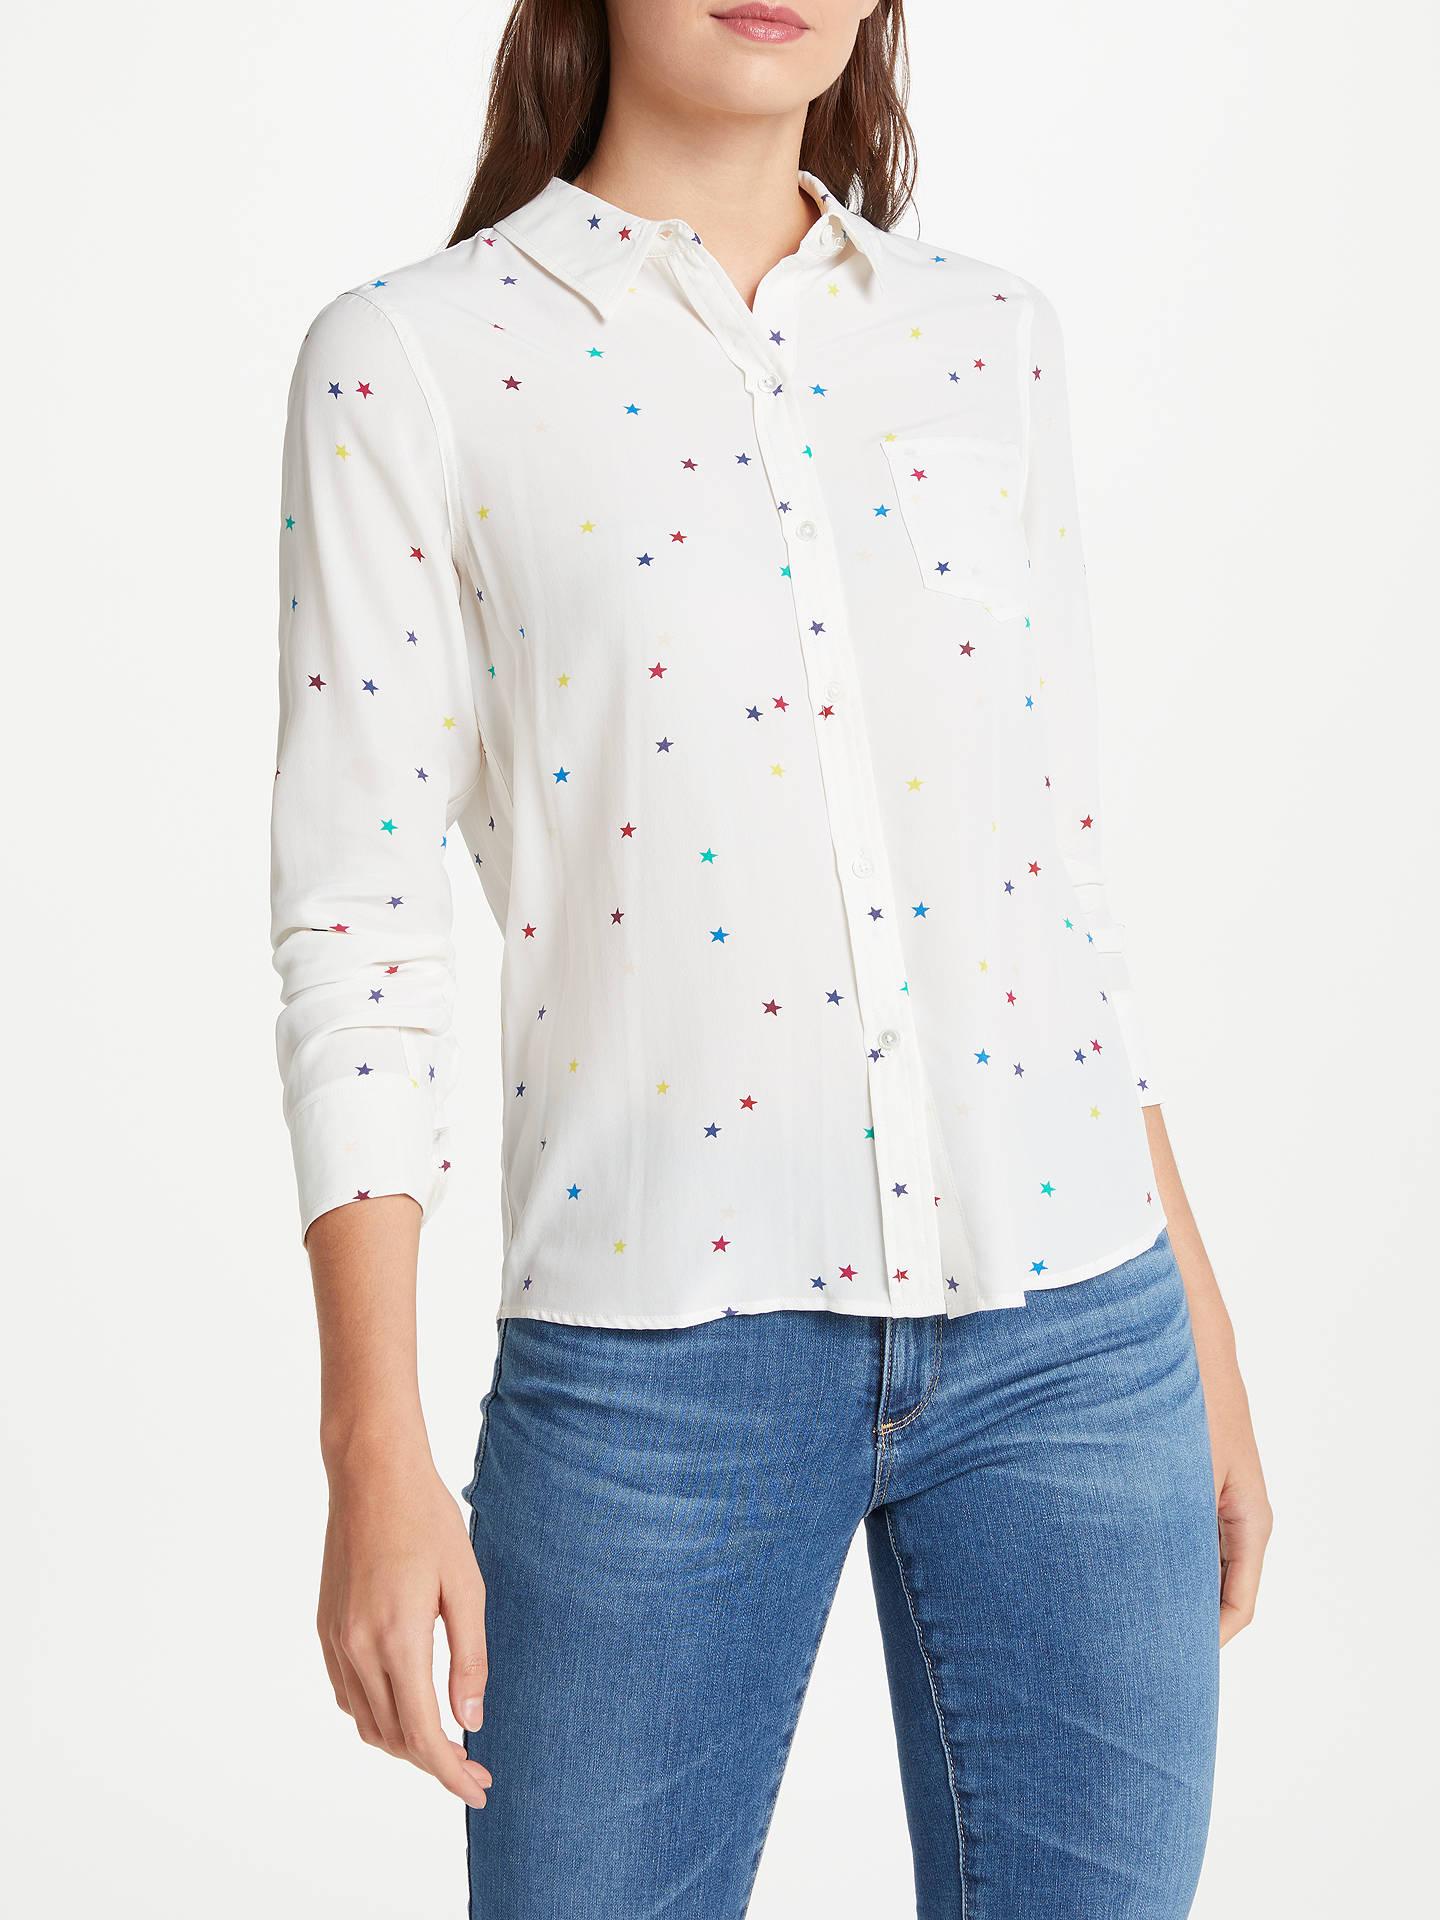 283384f97075b6 Buy Rails Kate Star Printed Silk Shirt, White Rainbow, XS Online at  johnlewis.